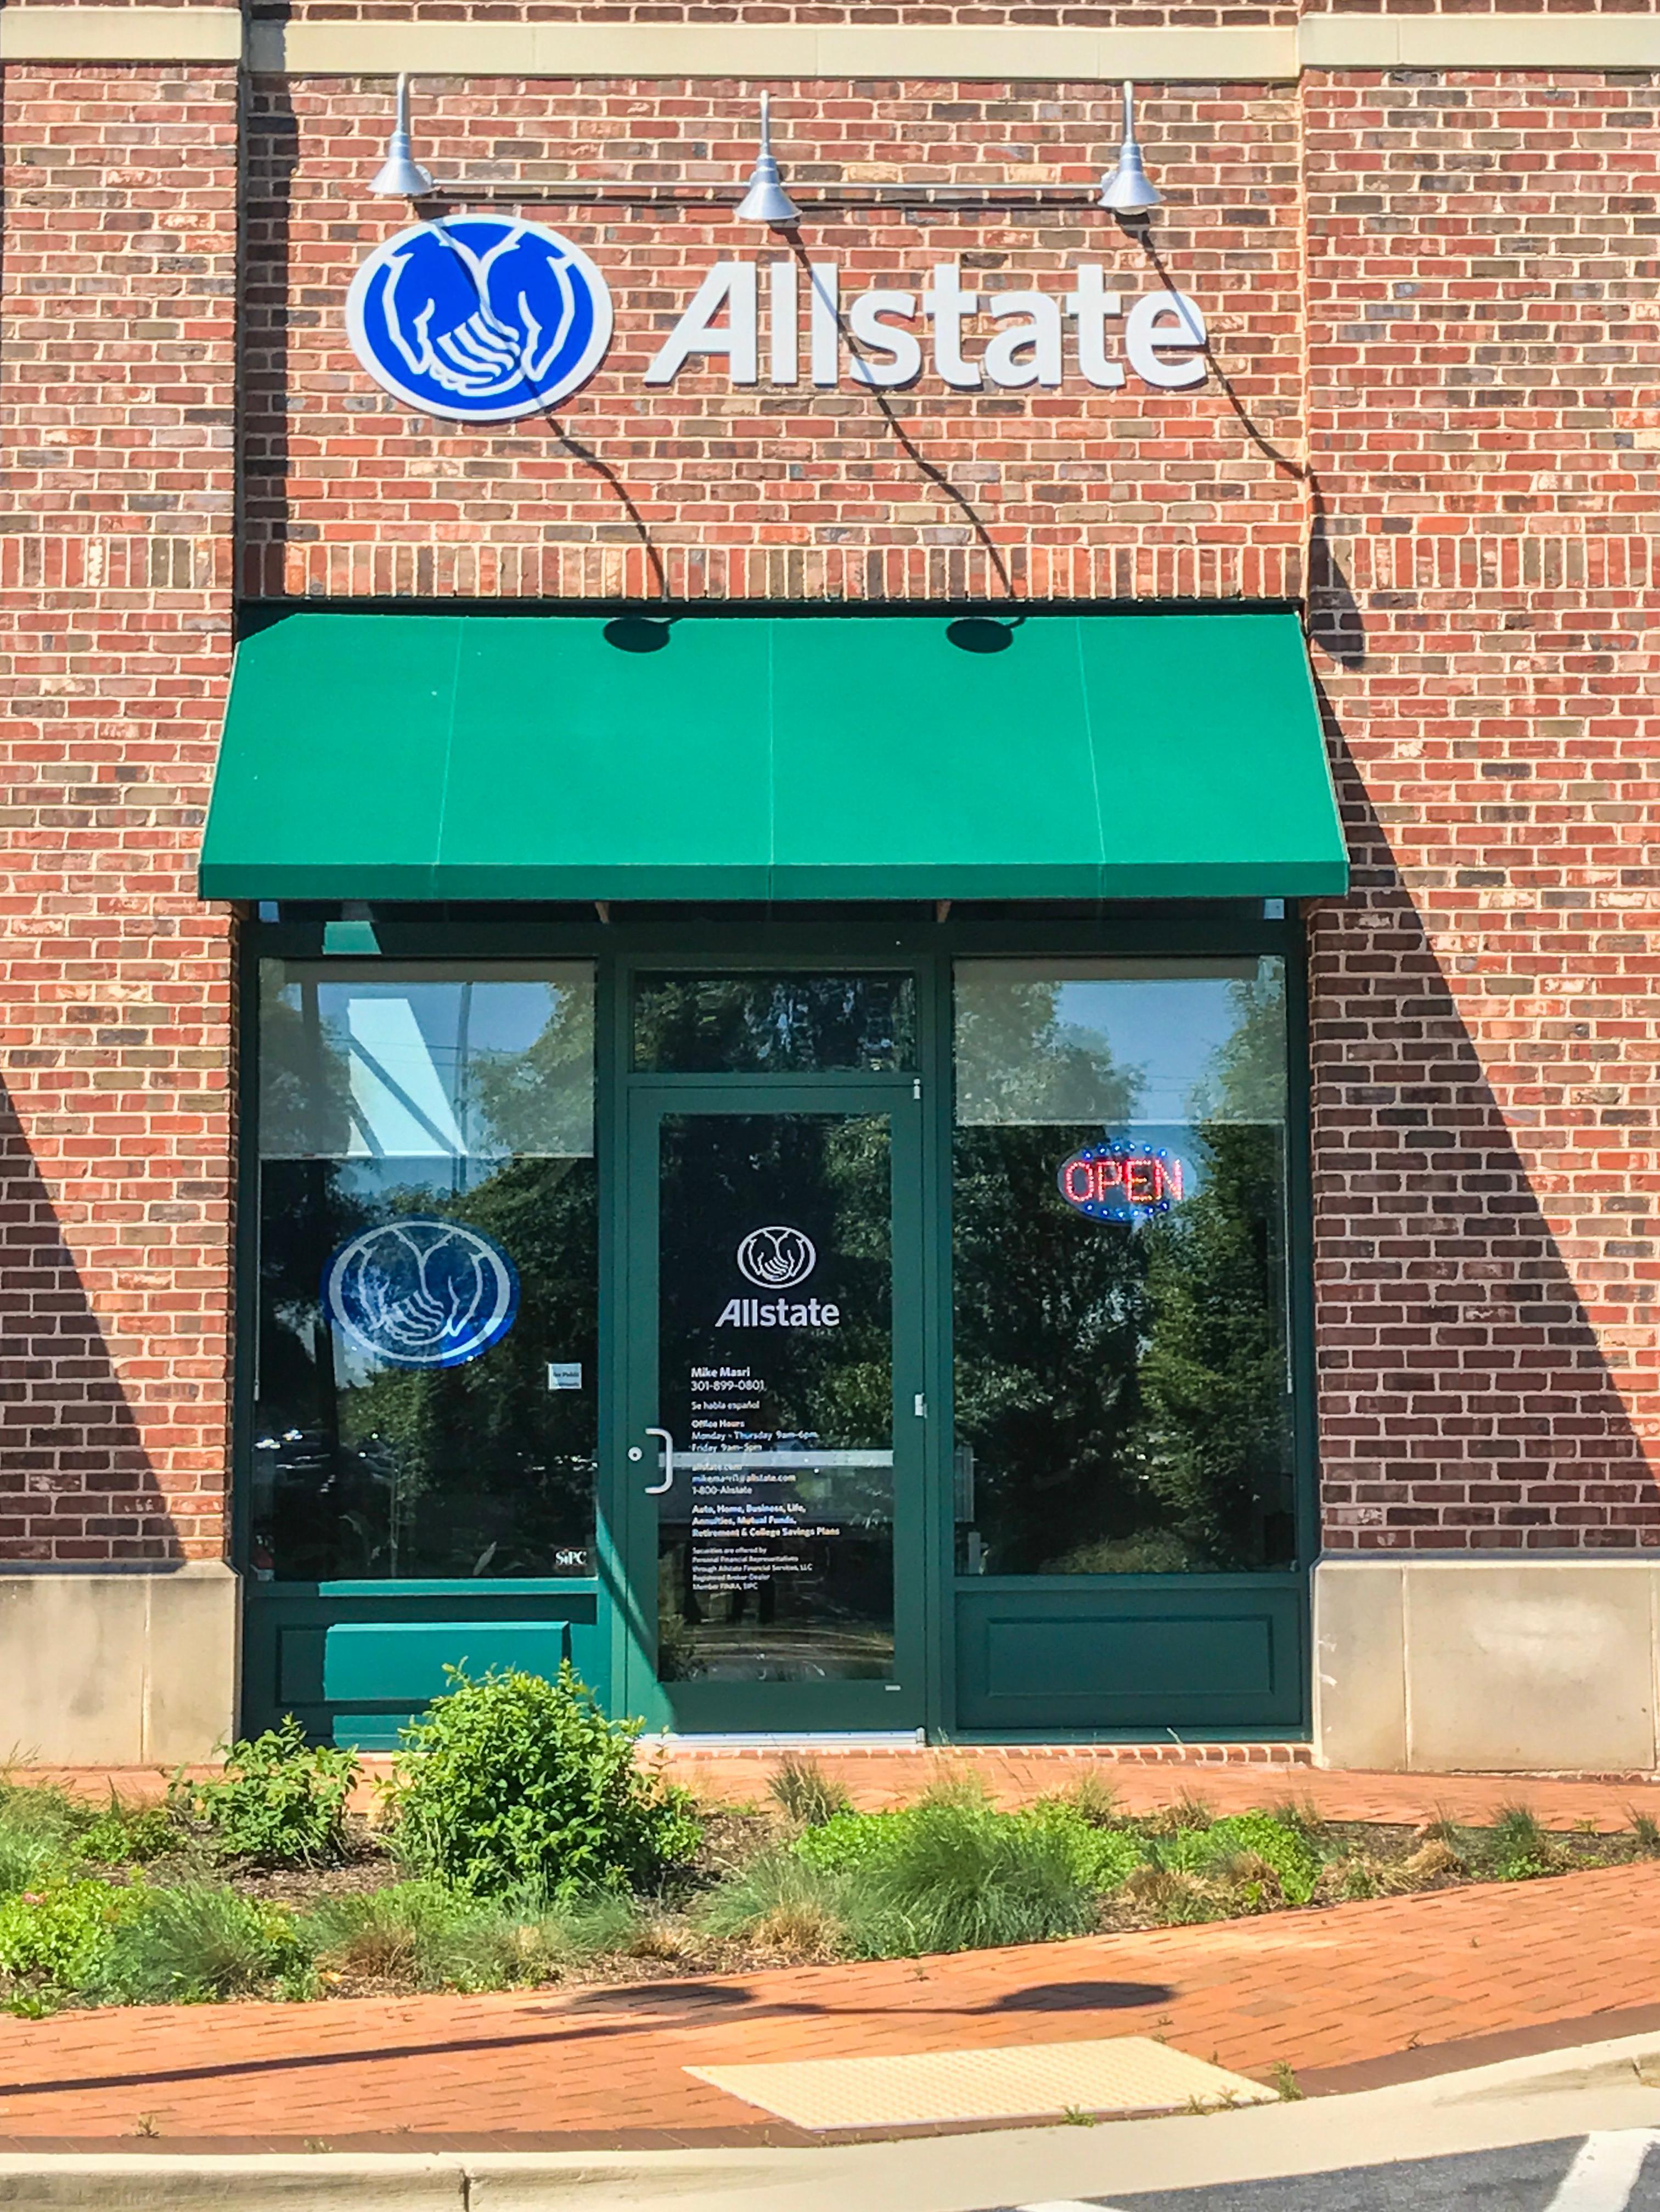 Mike Masri: Allstate Insurance image 1